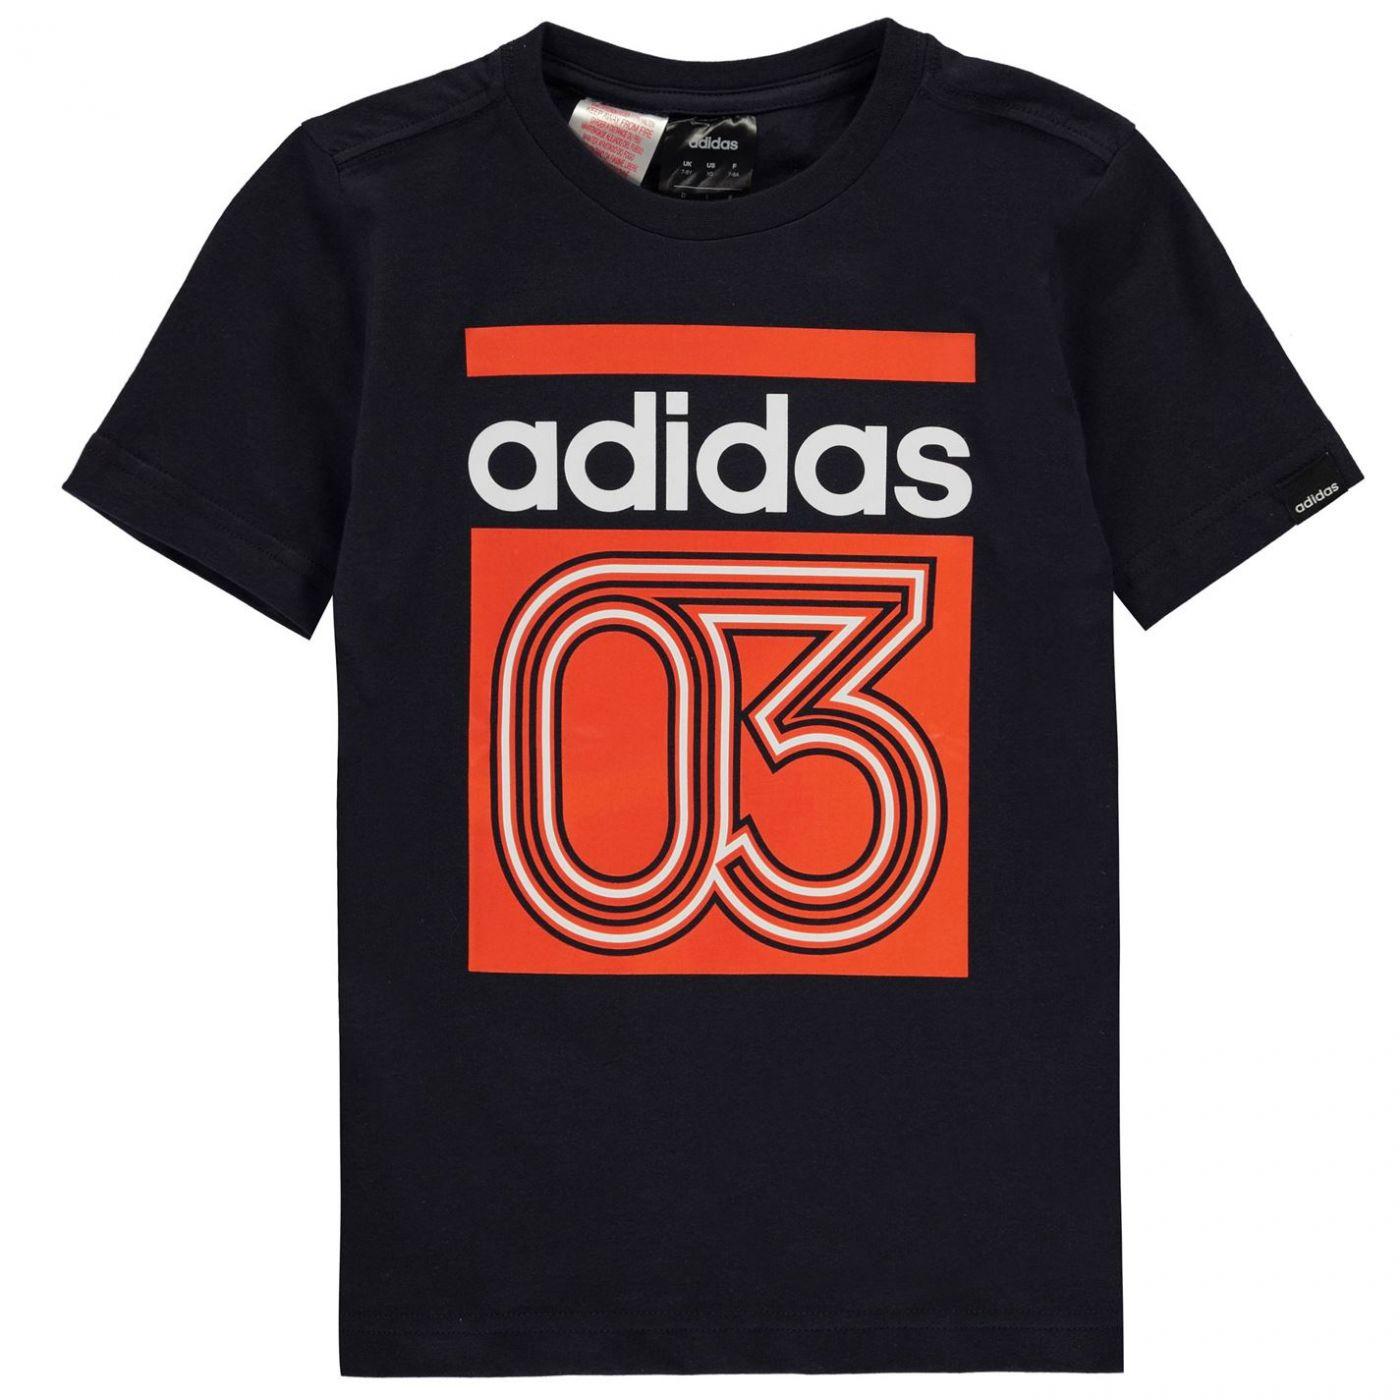 Adidas Boys Line 03 T-Shirt QT